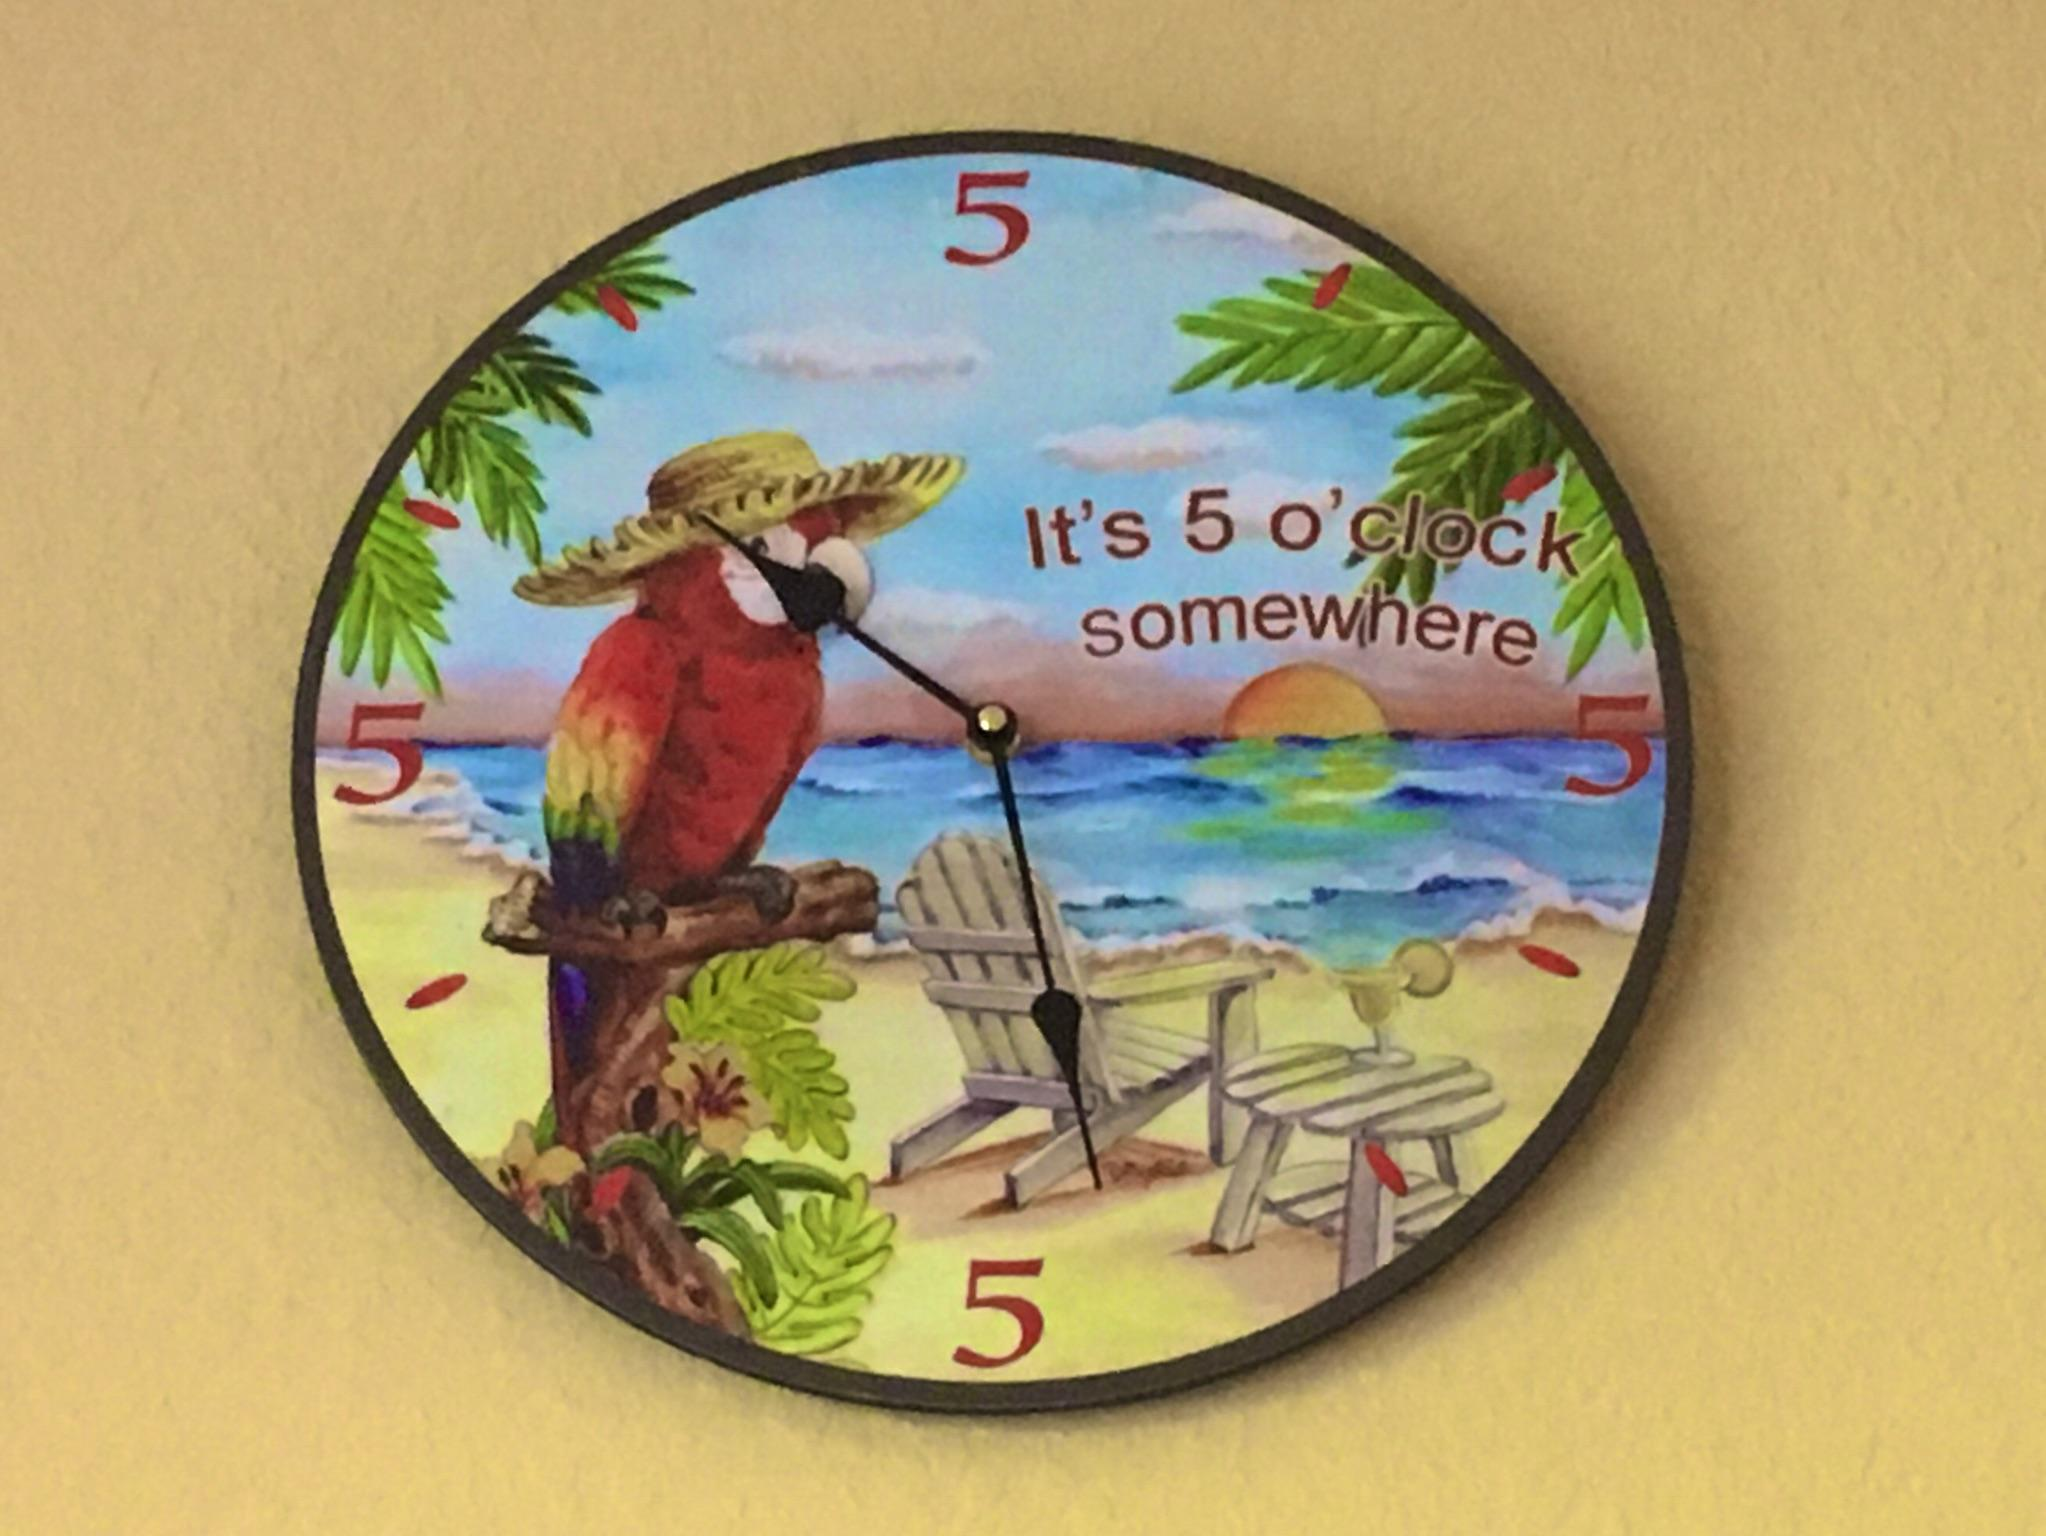 It's Always 5 o'clock at Palm Tree Paradise!